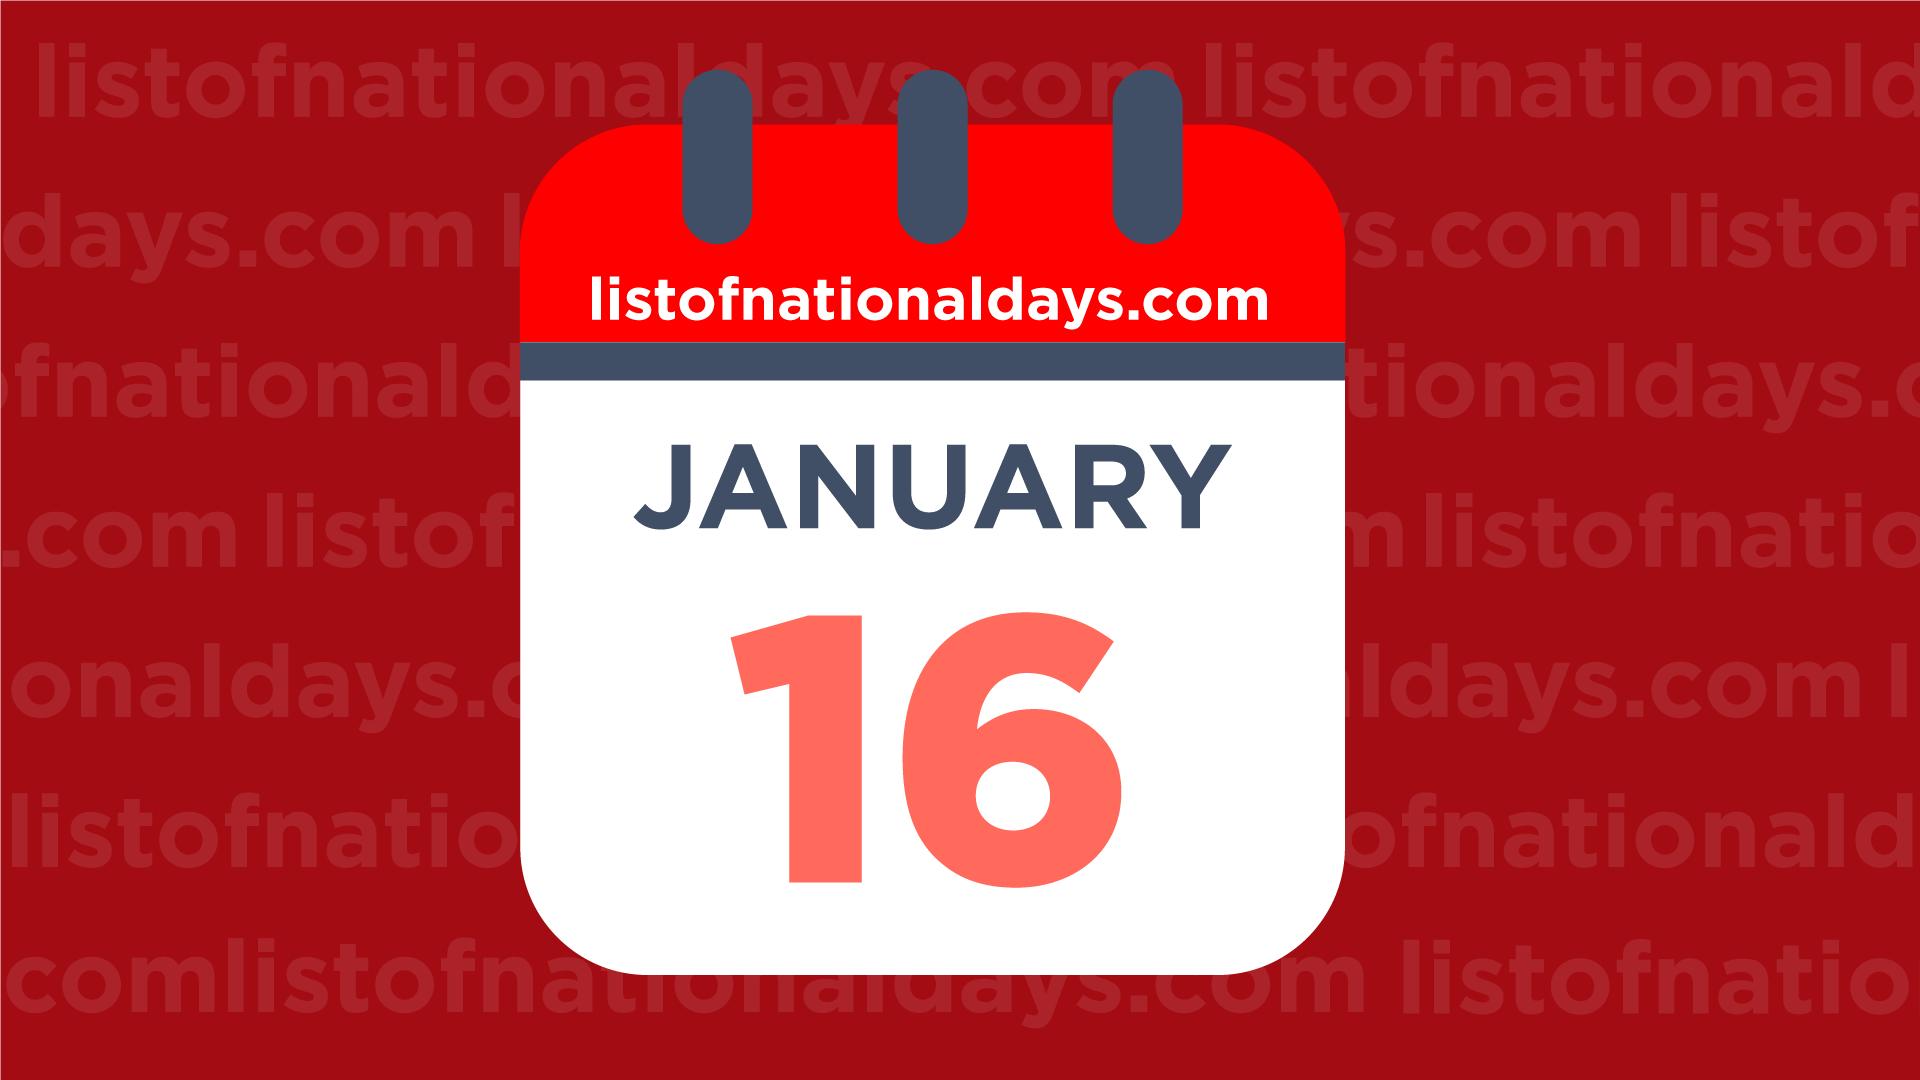 January 16Th: National Holidays,observances & Famous Birthdays for January 16 Holidays & Observances